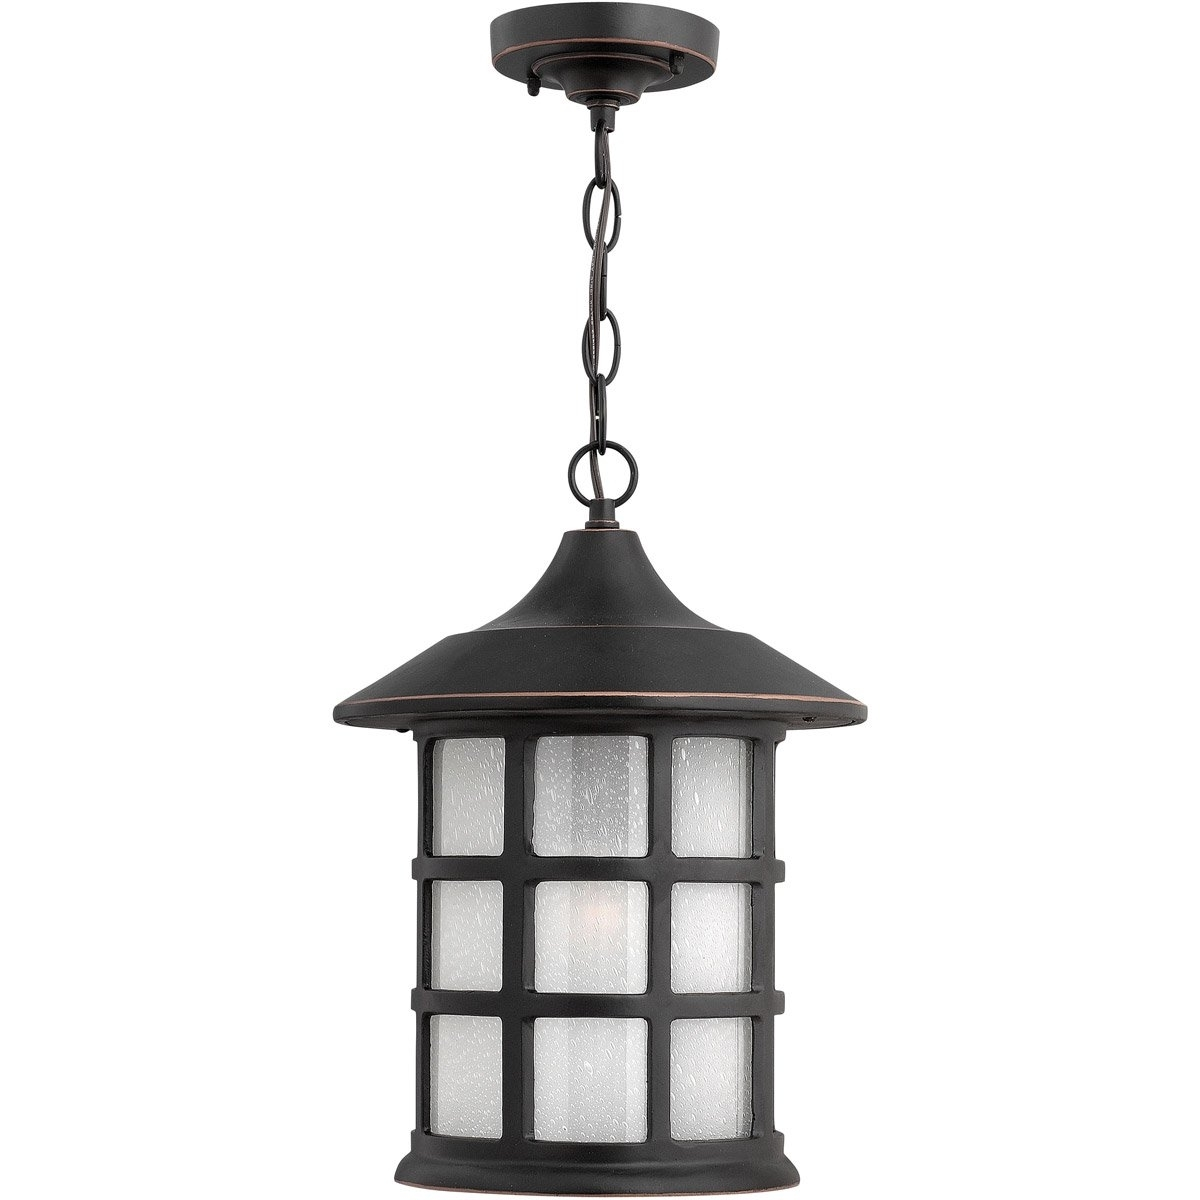 Trendy Hinkley Outdoor Hanging Lights Pertaining To Hinkley Lighting 1802op Freeport 1 Light 10 Inch Olde Penny Outdoor (View 16 of 20)